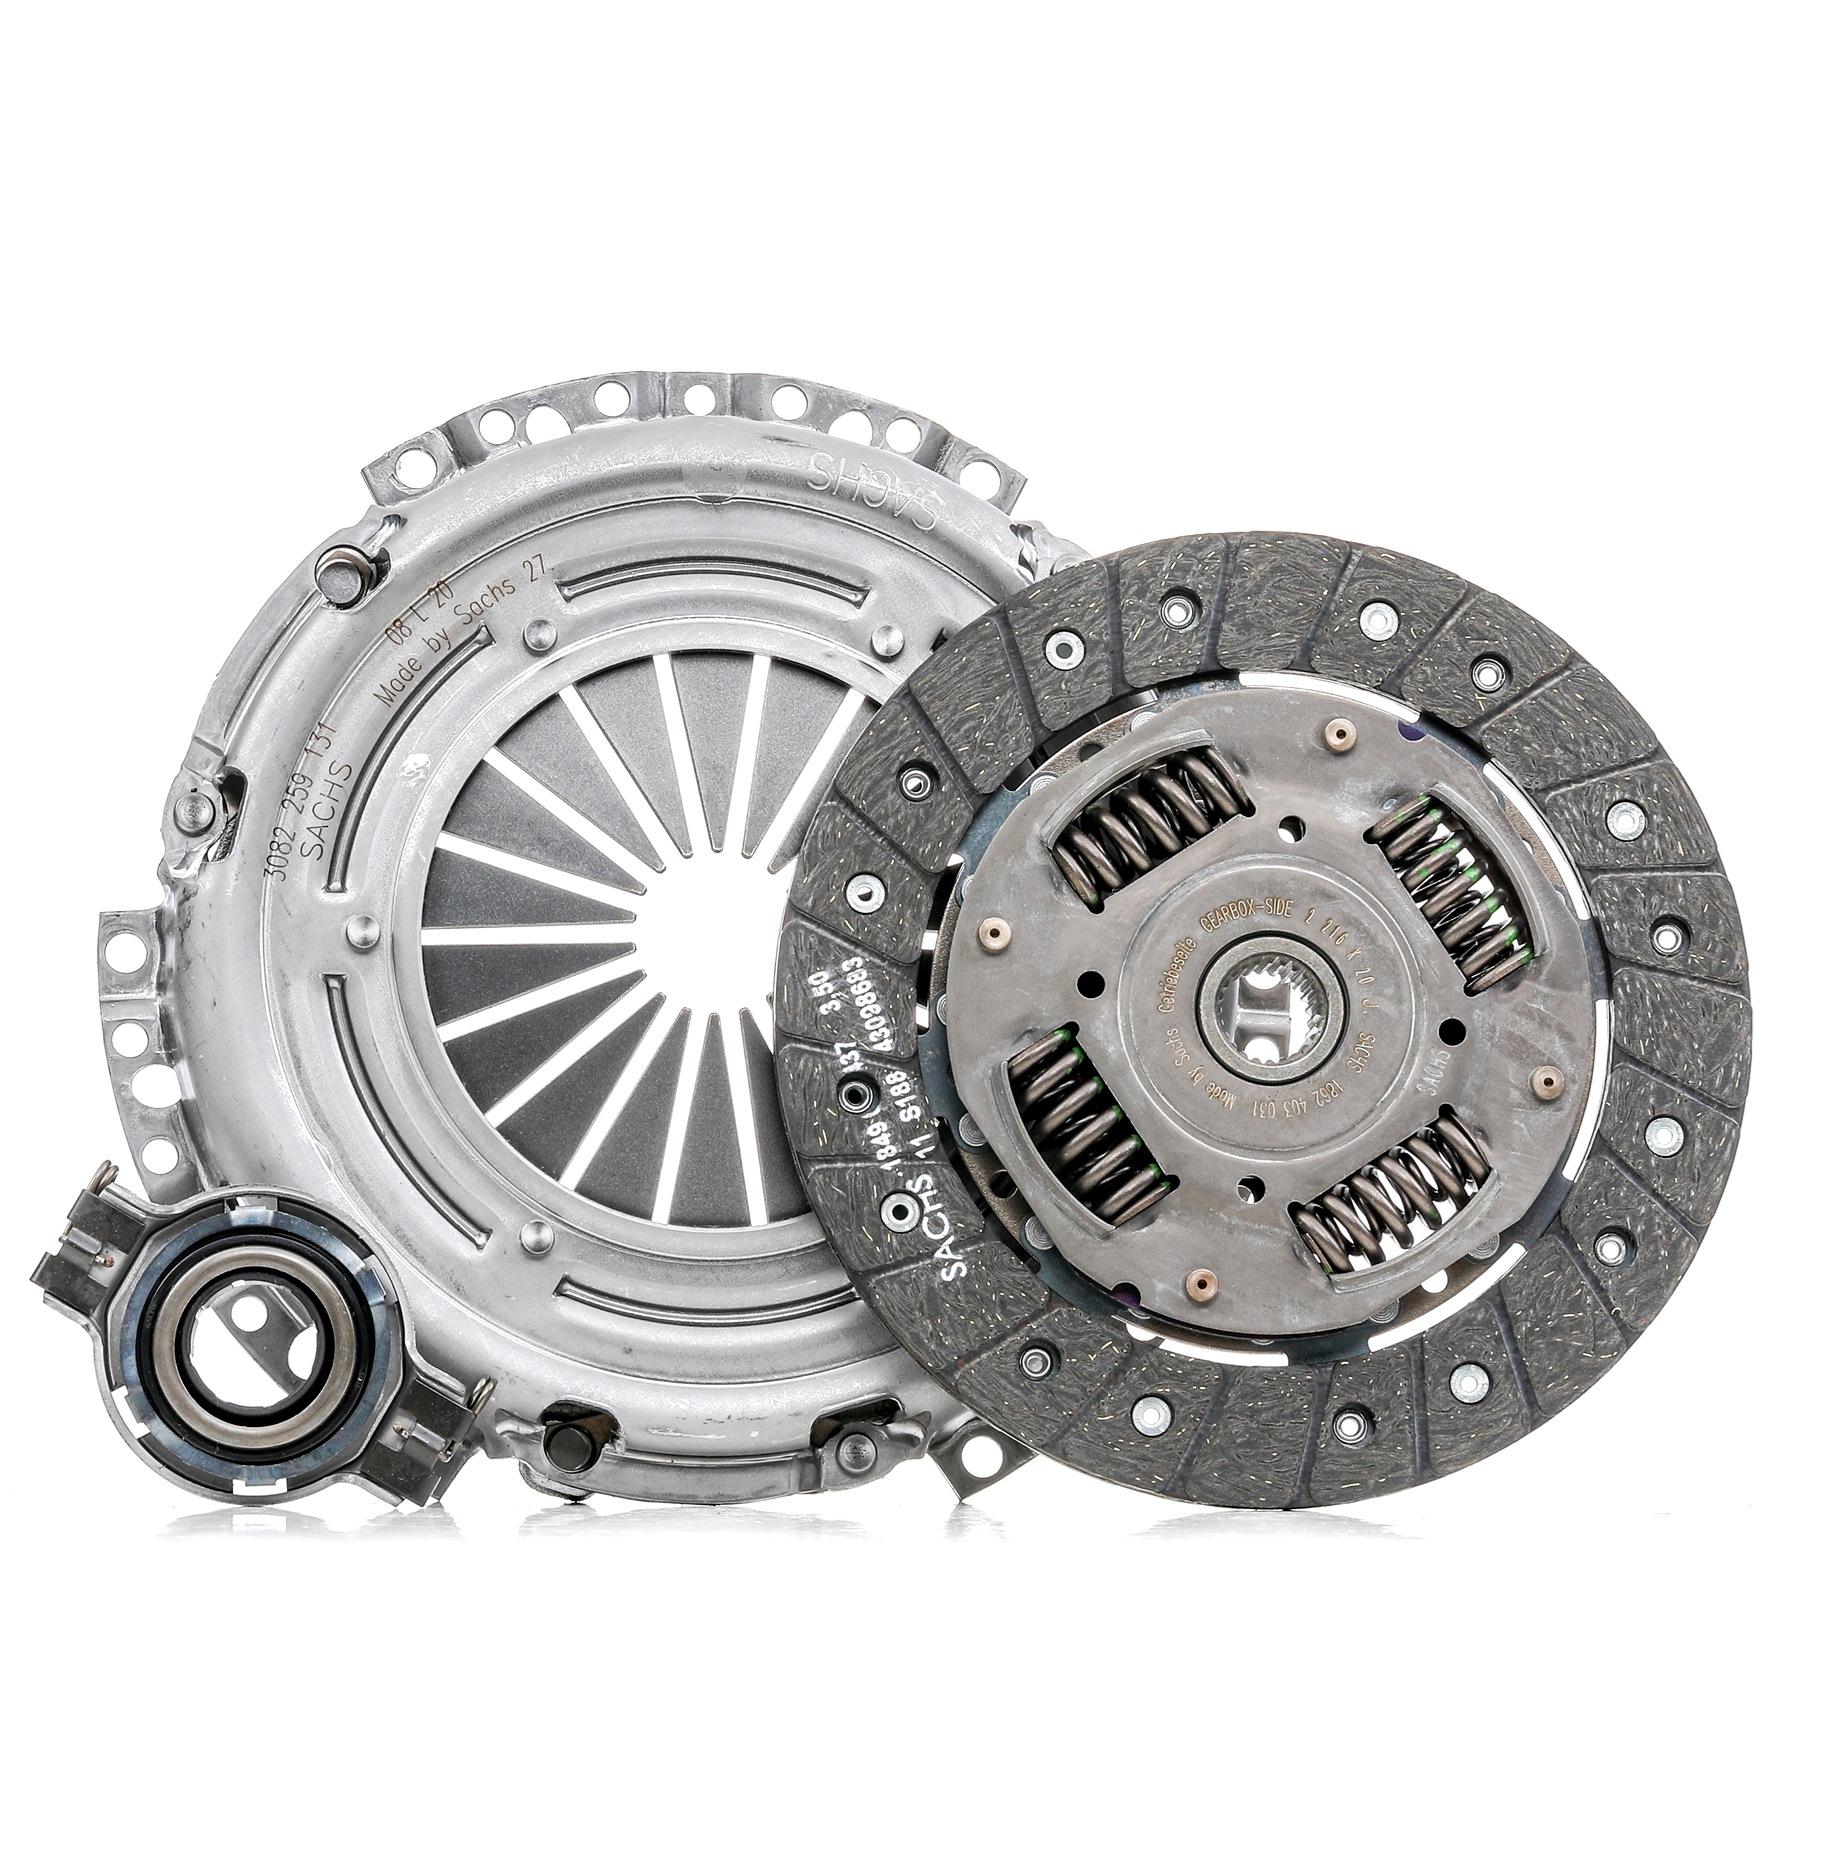 VW POLO 2014 Kupplung - Original SACHS 3000 581 002 Ø: 200mm